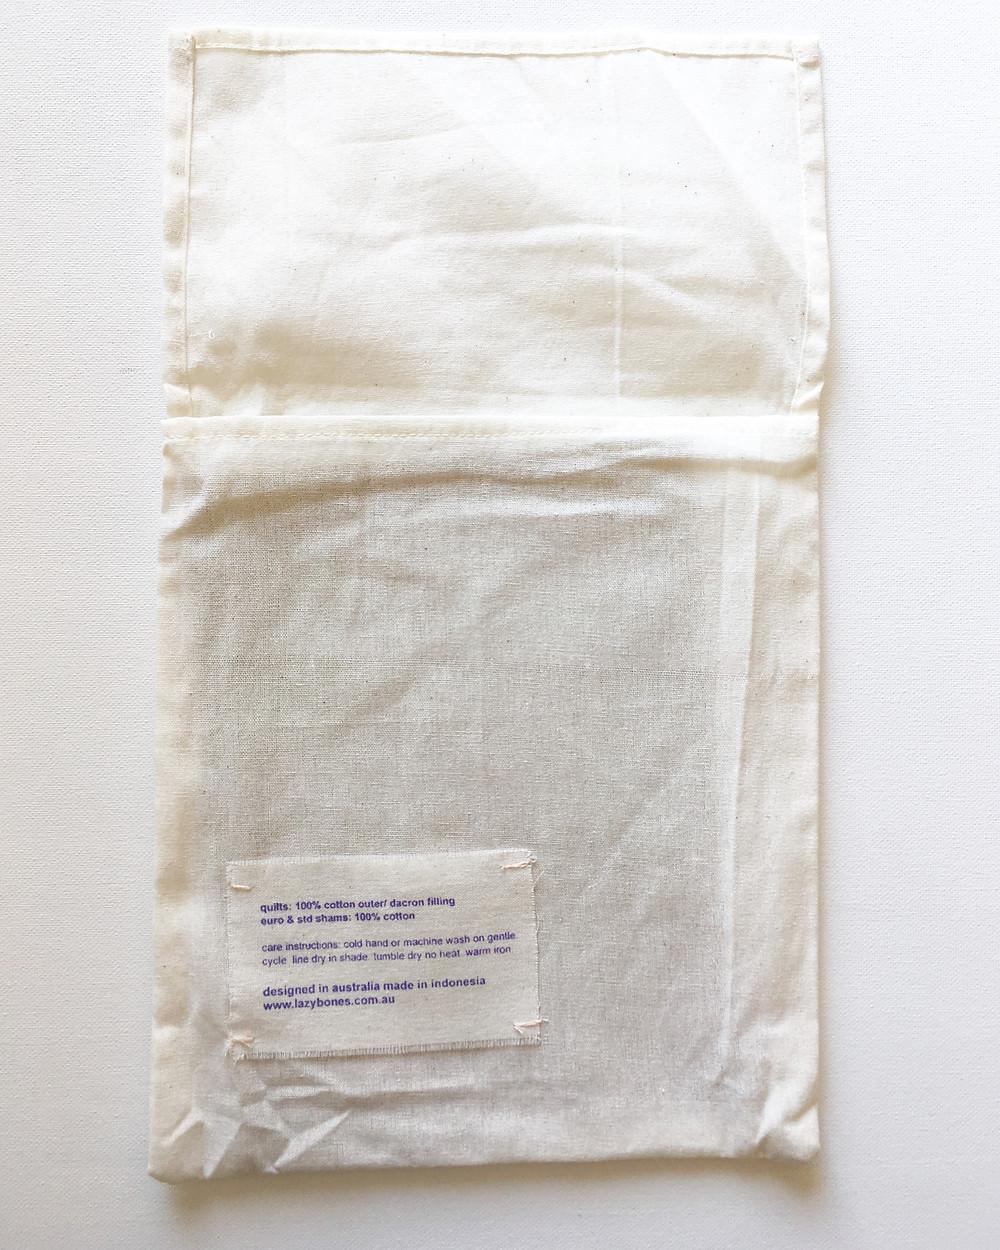 Packaging Design Lazybones Pillow Shams